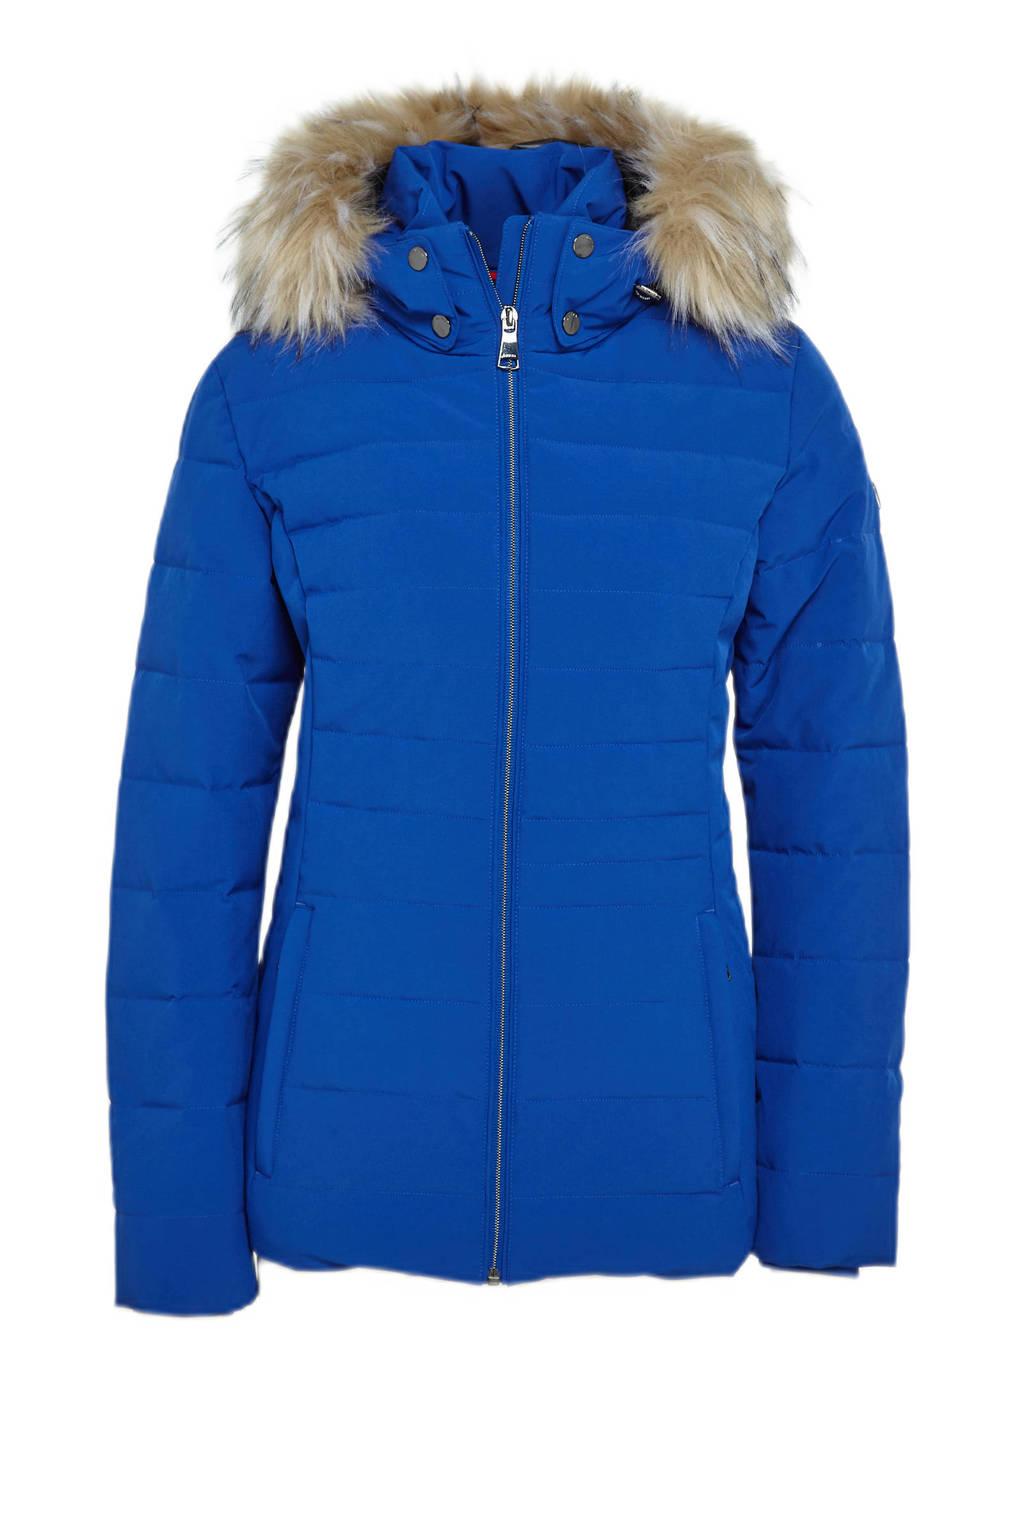 Luhta jas Huiltuniemi kobaltblauw, Kobaltblauw